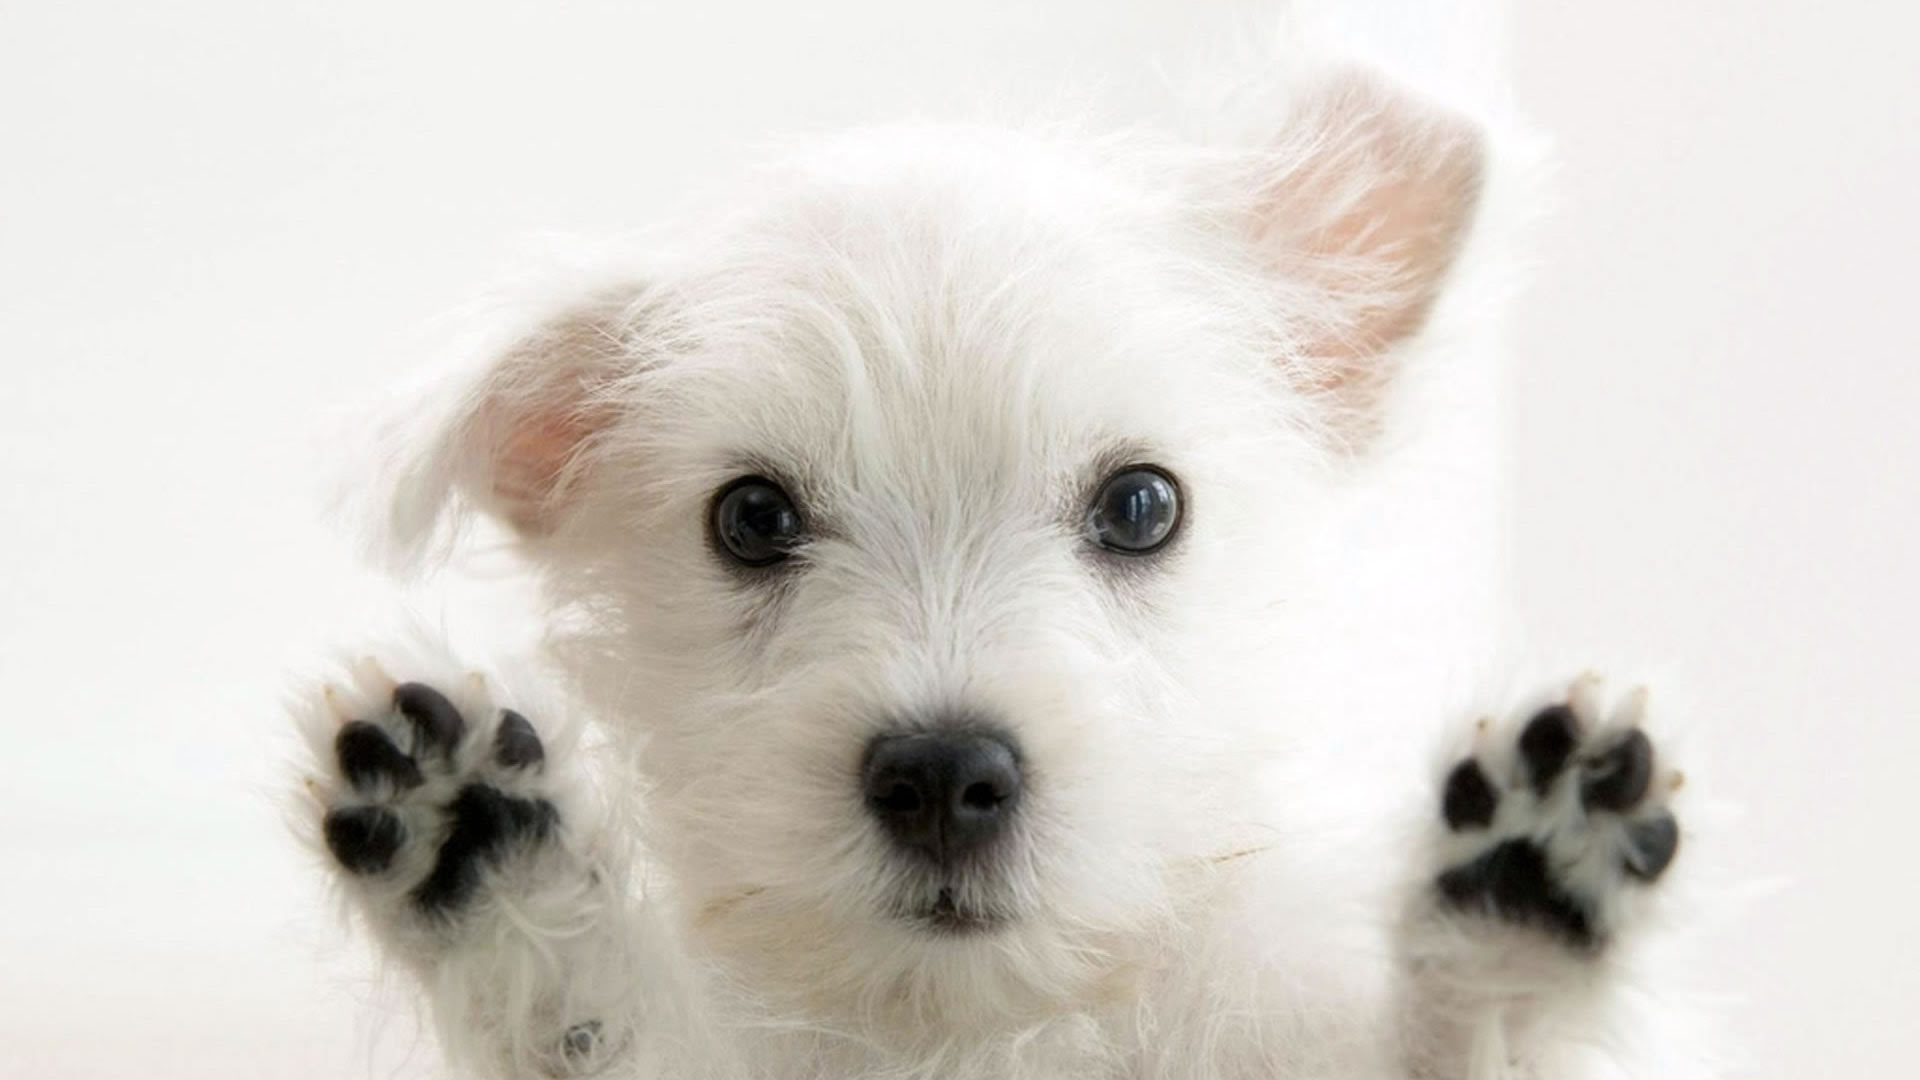 Very cute Puppy Wallpaper [1920x1080]